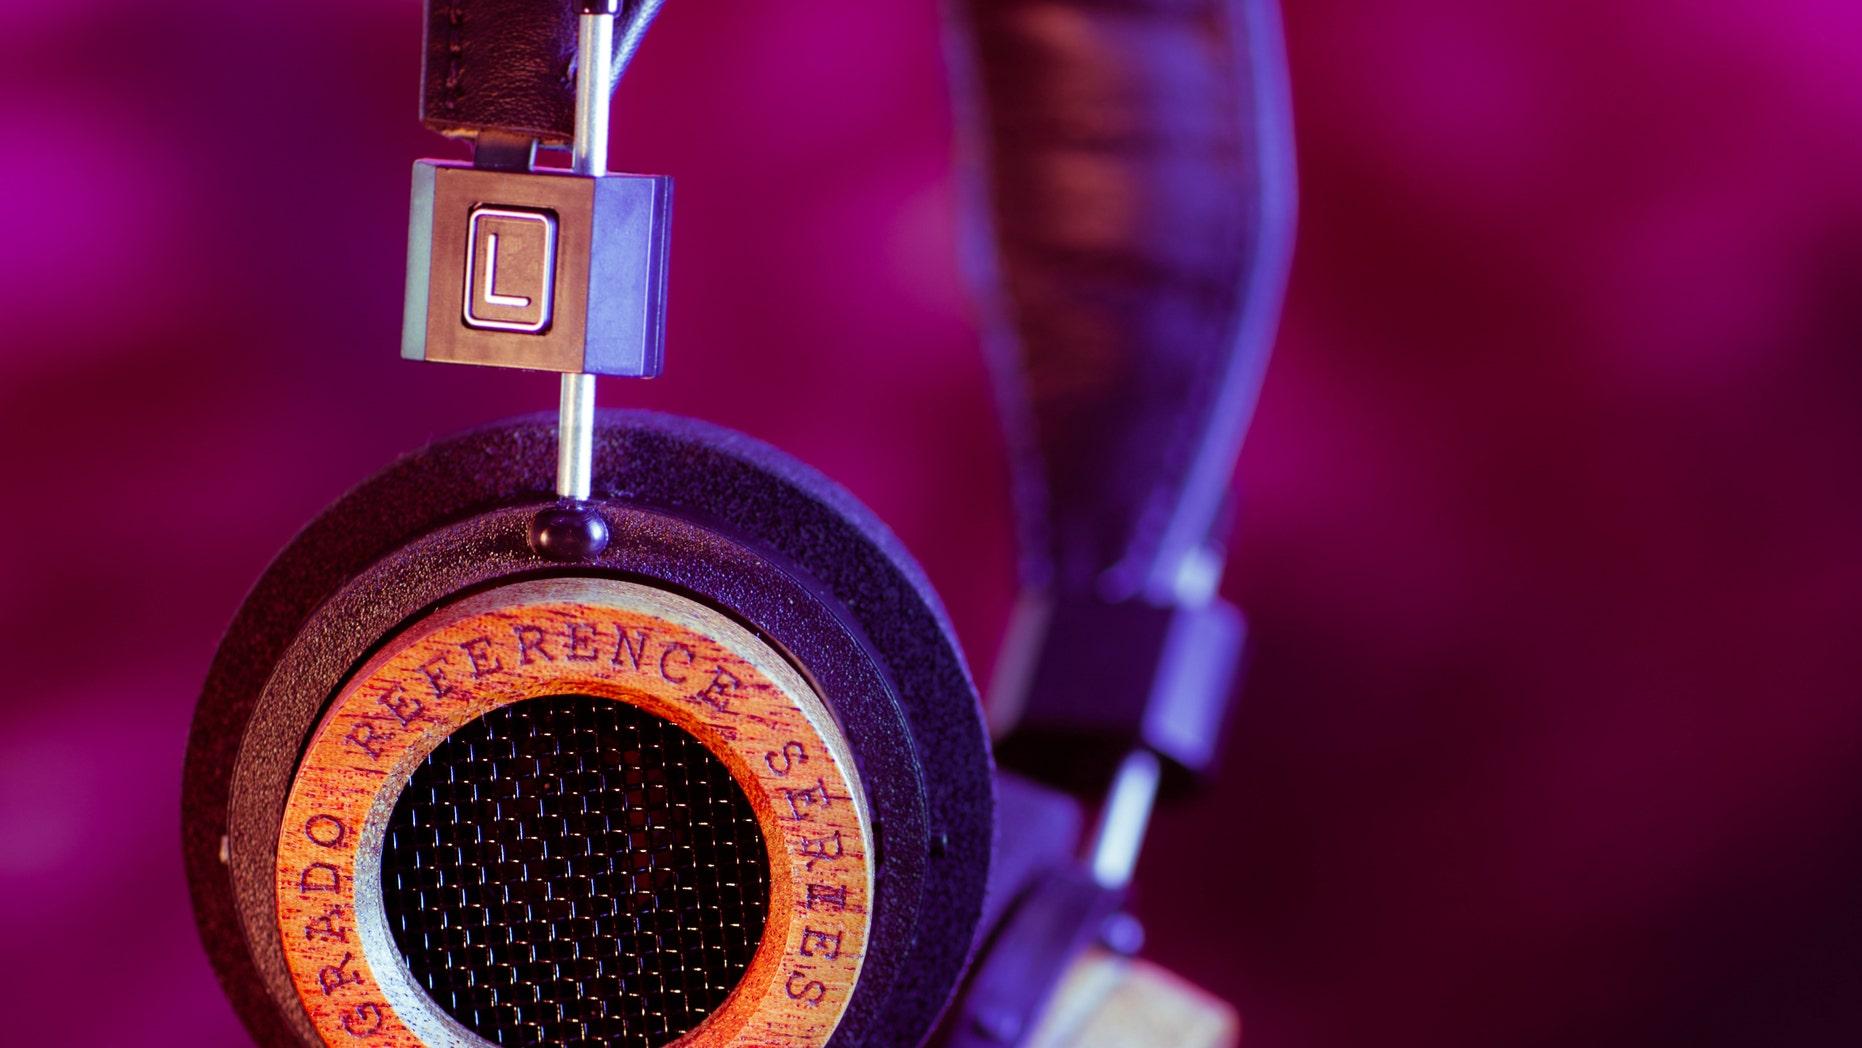 Grado headphones.